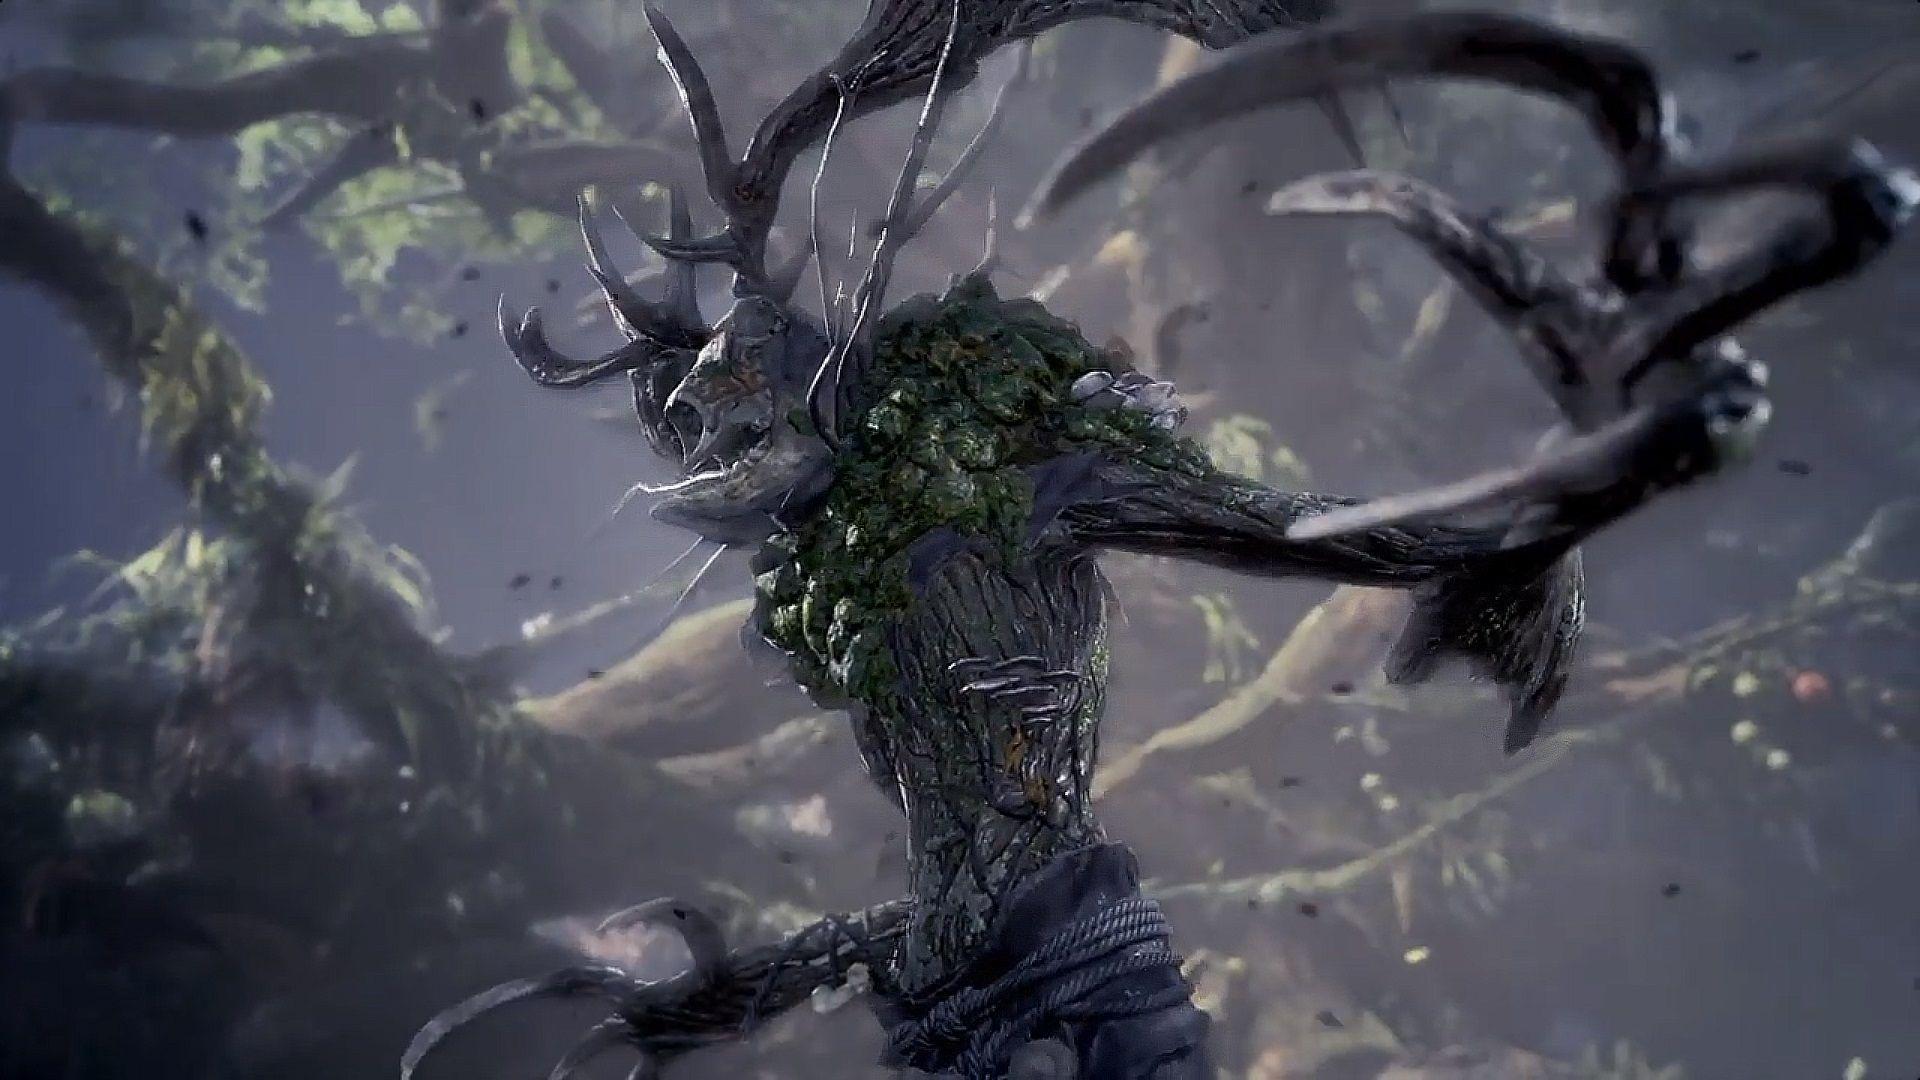 Monster Hunter World' 6 01 Update Makes Ancient Leshen Quest